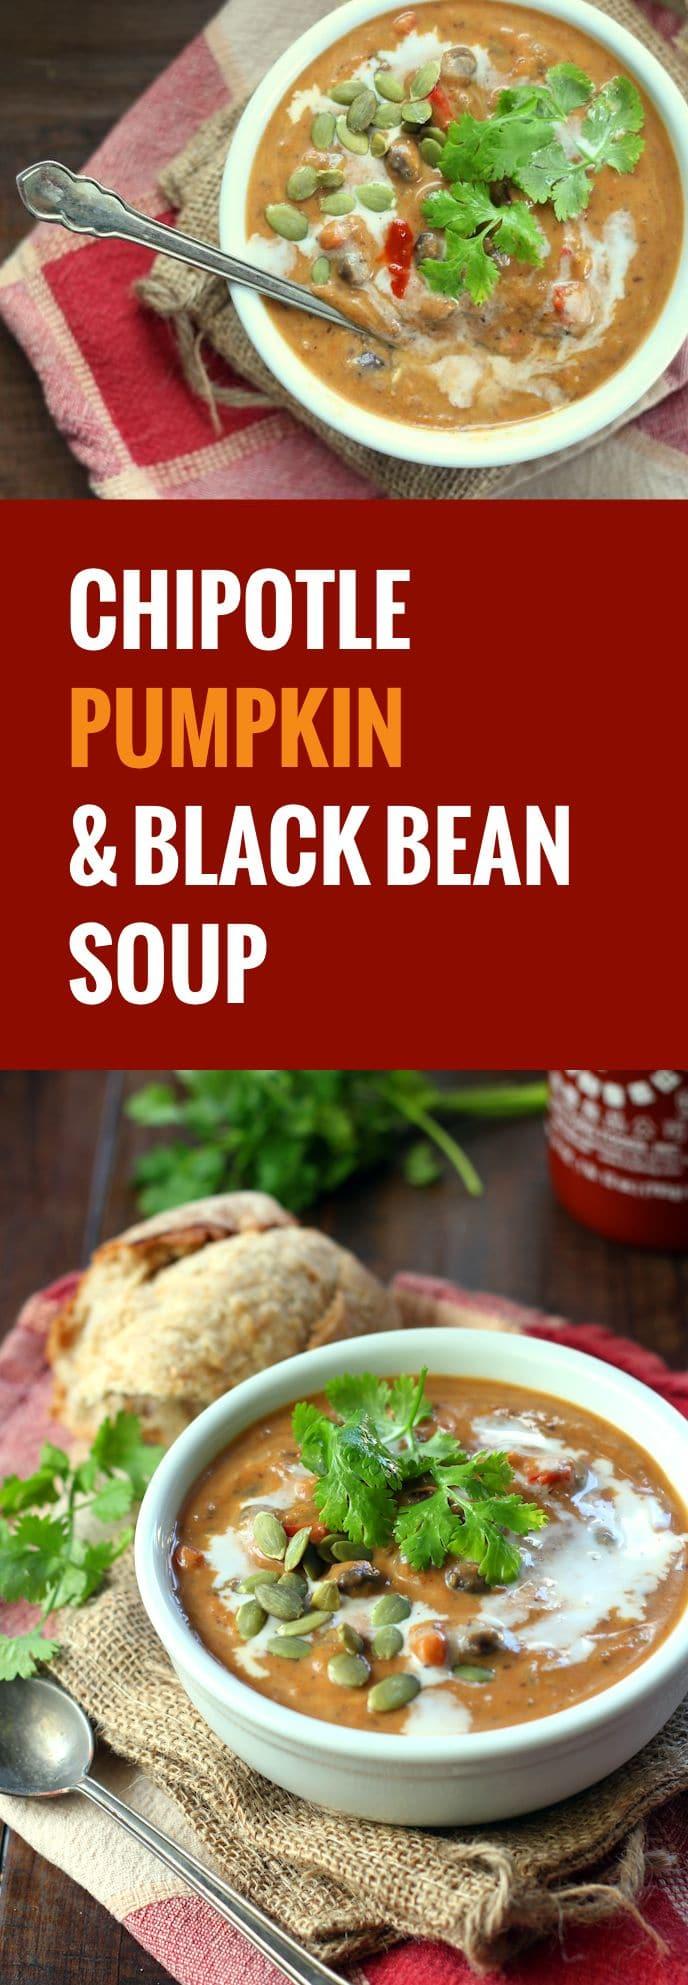 Chipotle Pumpkin Black Bean Soup